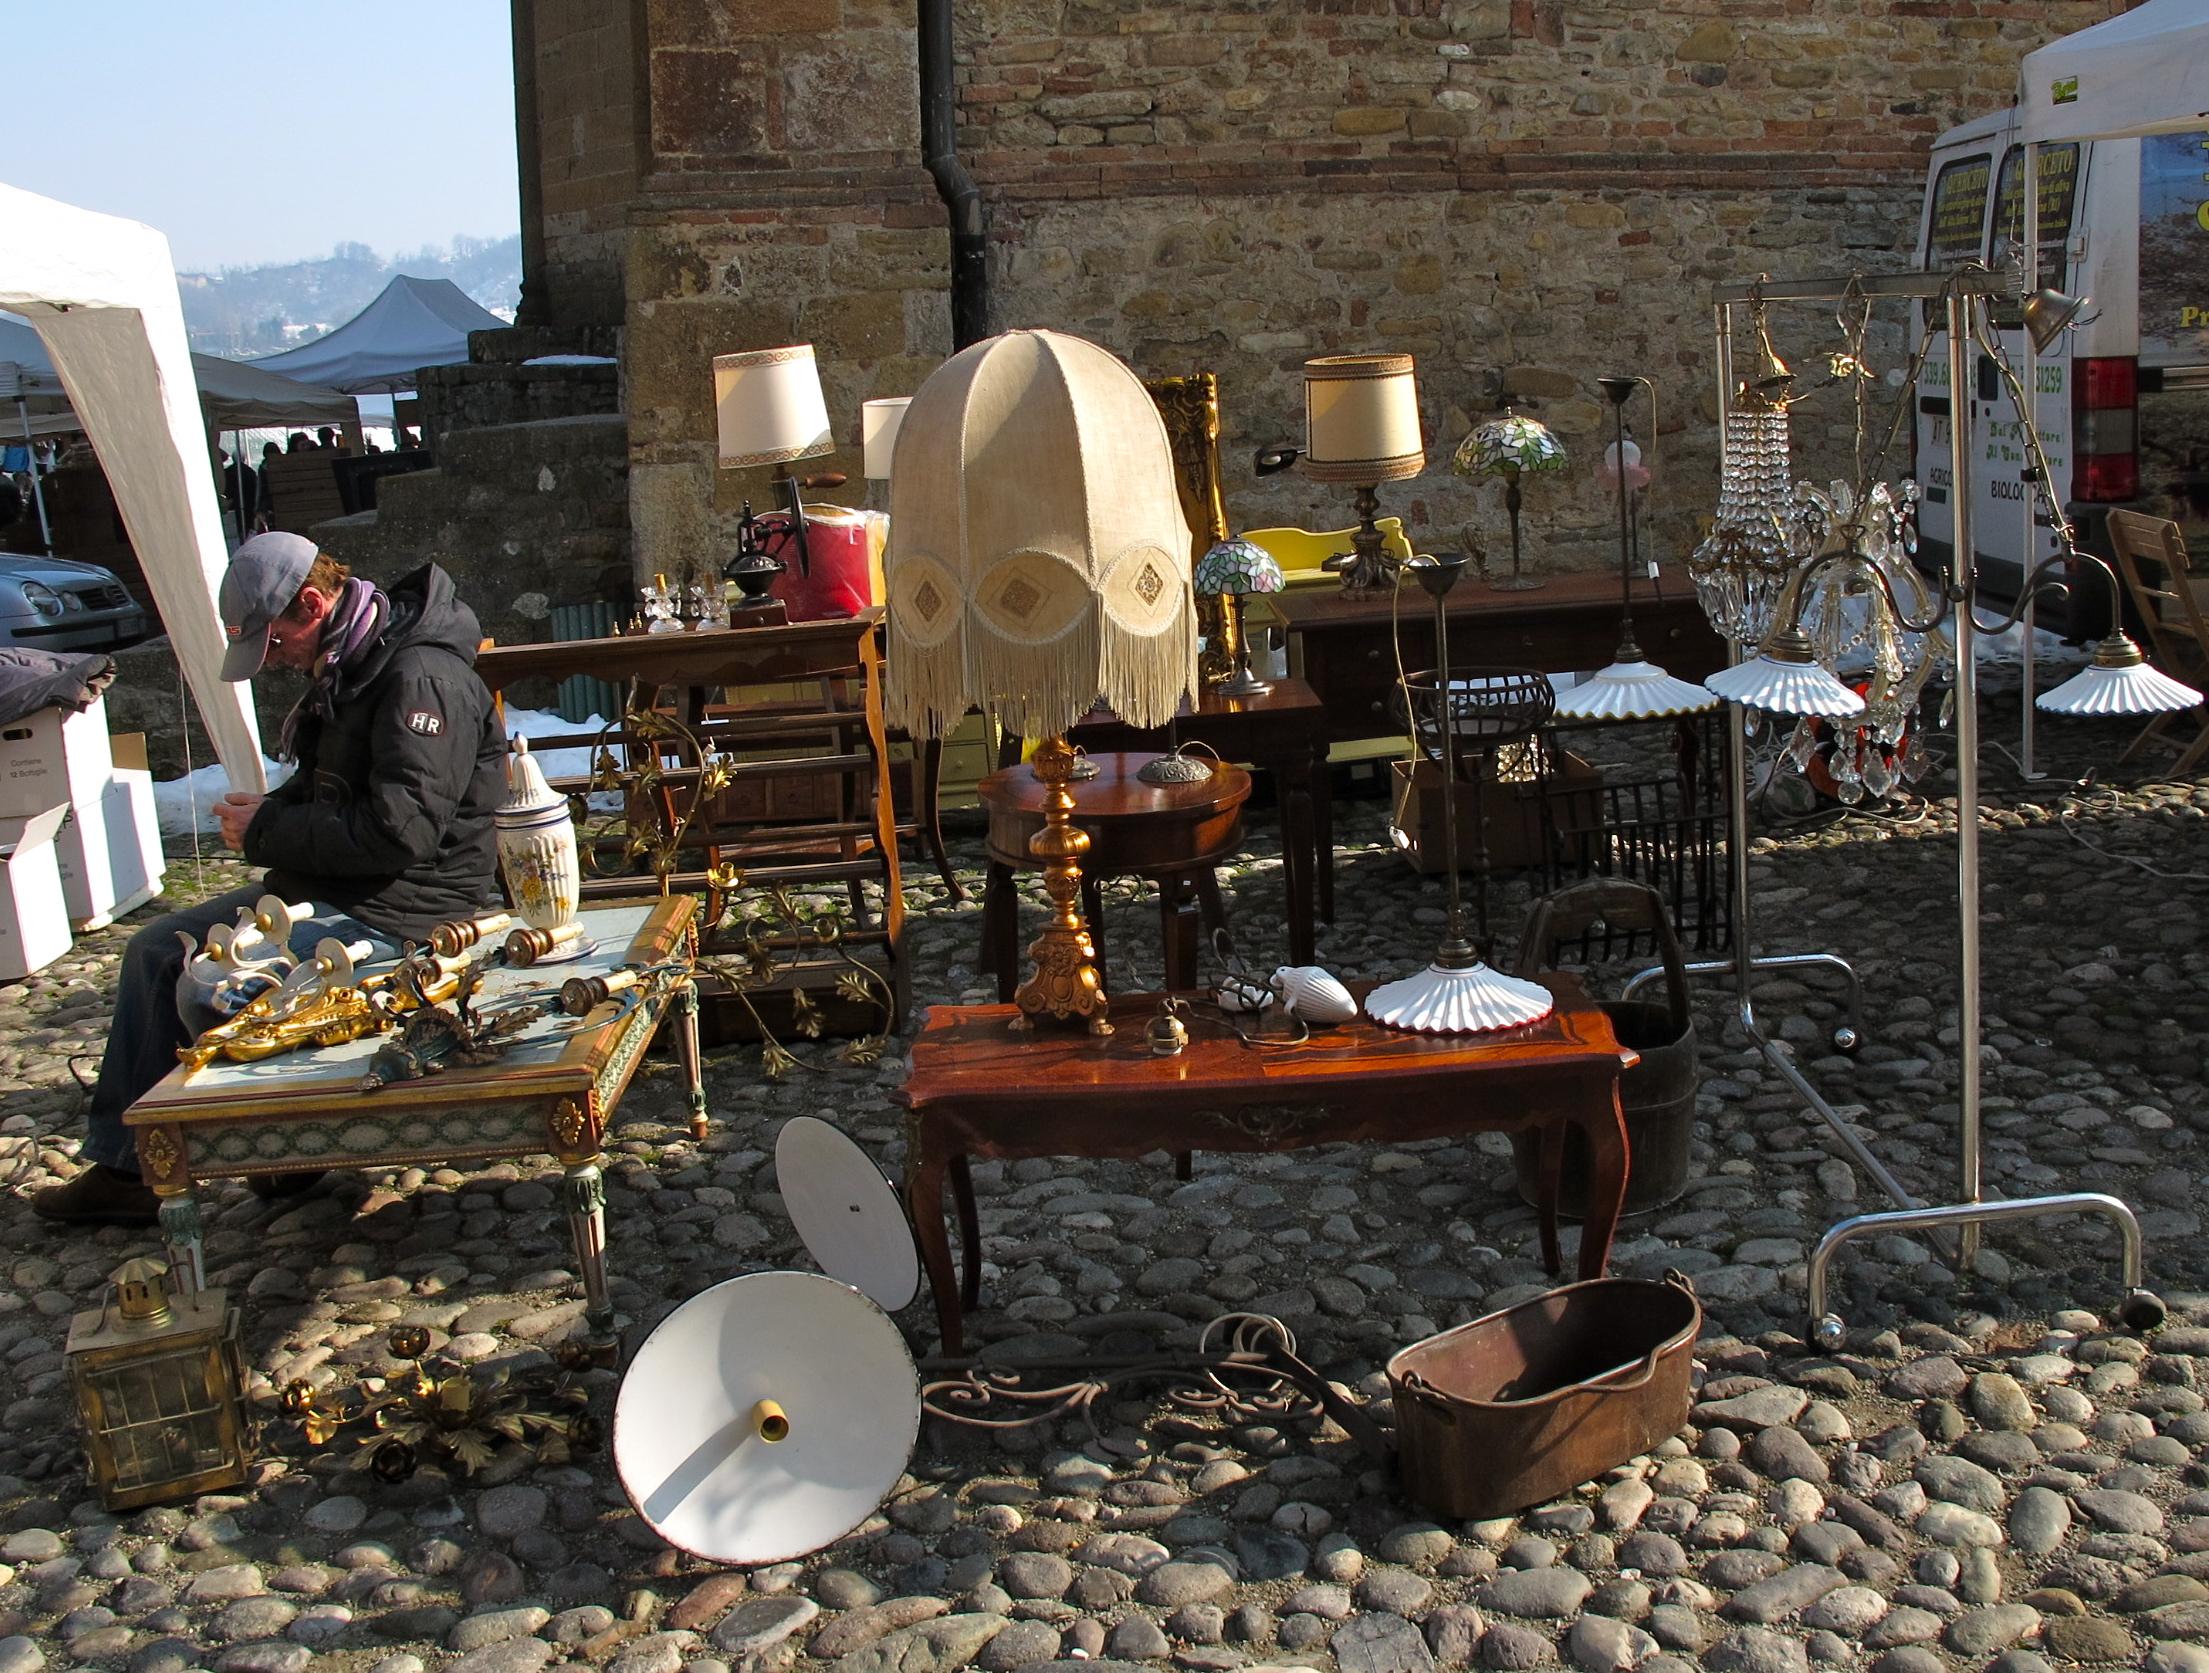 Castell arquato turismo oggi tanta gente al mercatino for Mercatini antiquariato oggi